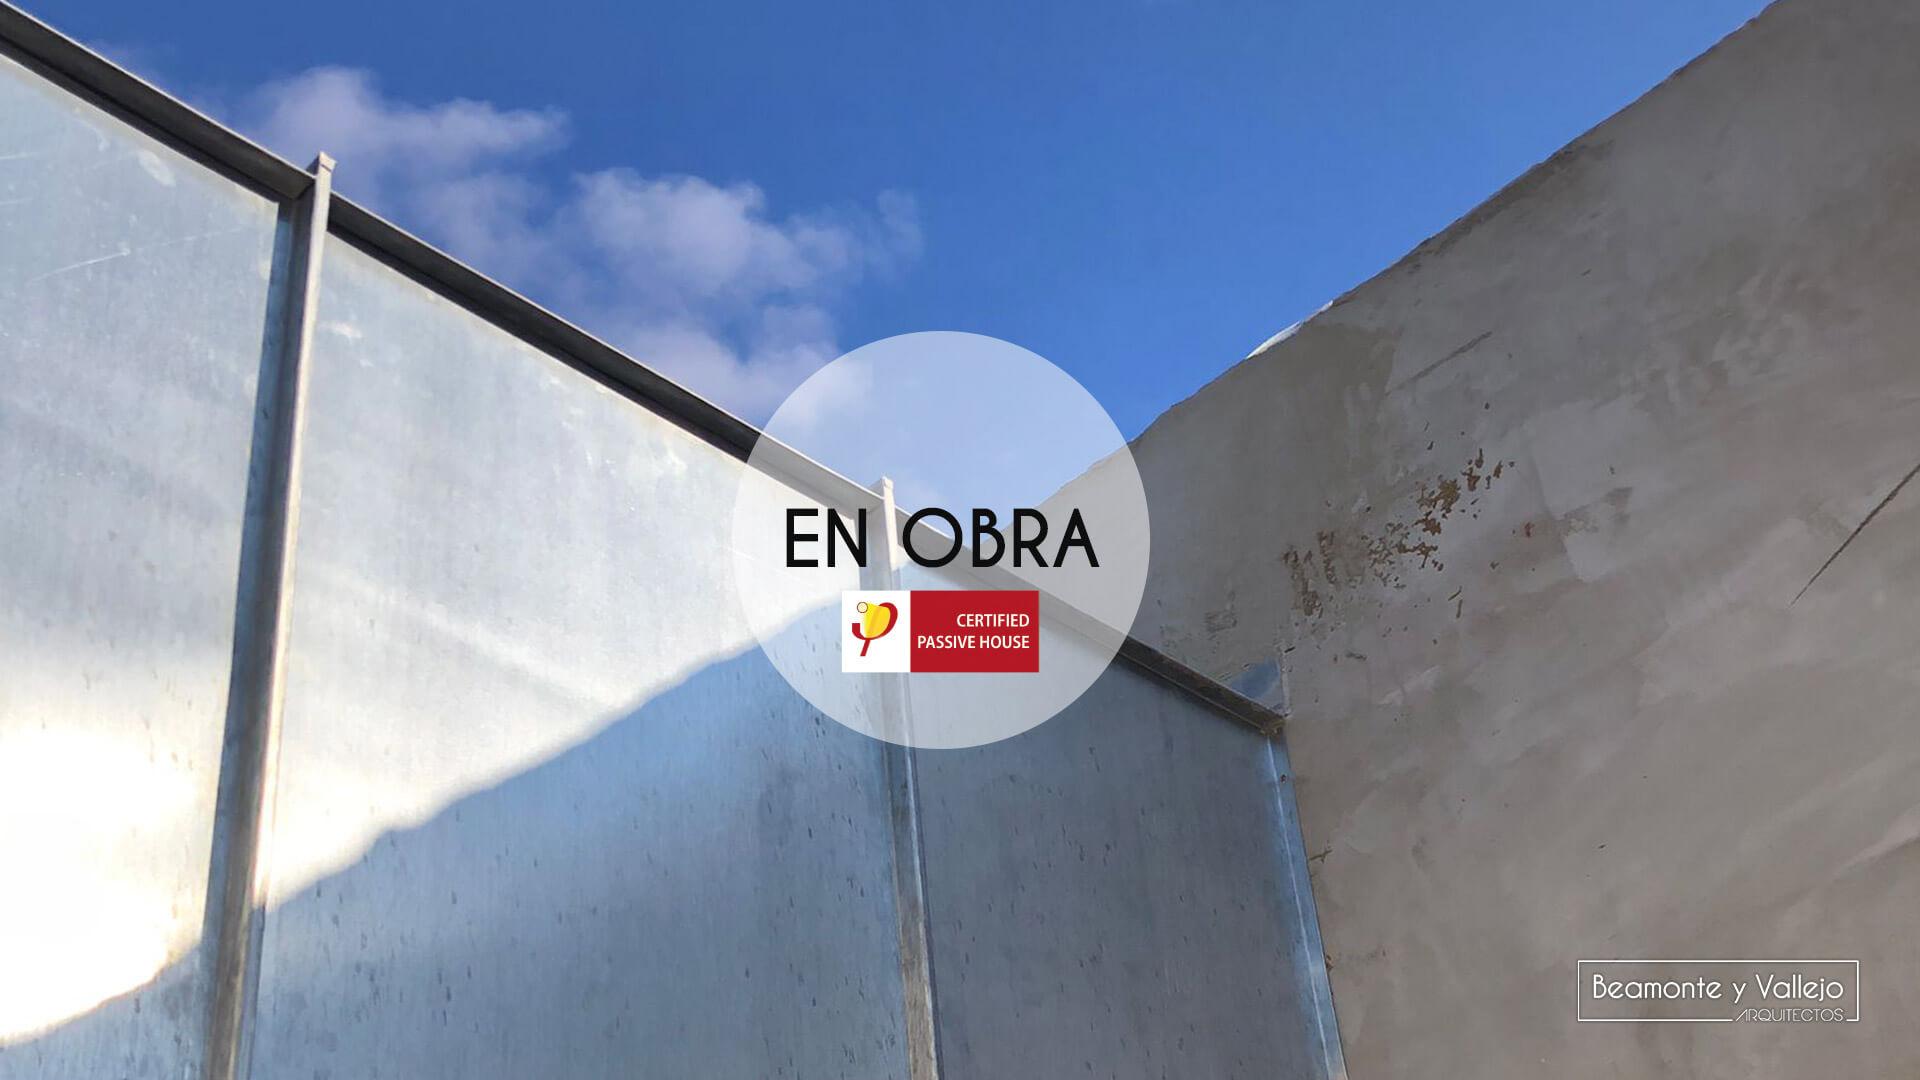 Beamonte y Vallejo arquitectos - Passivhaus El Zorongo II en obra - 04